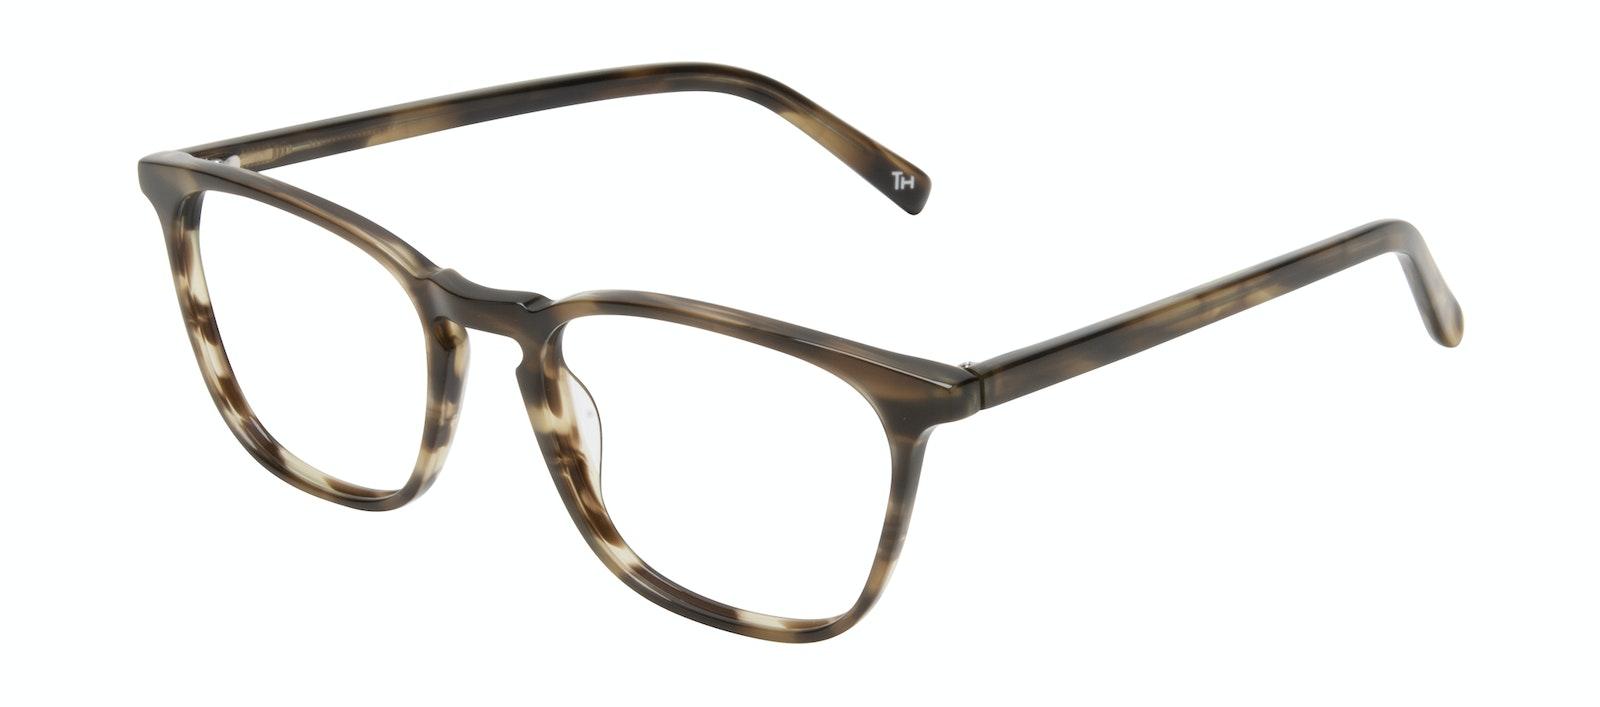 Affordable Fashion Glasses Square Eyeglasses Men Louise Storm Tilt